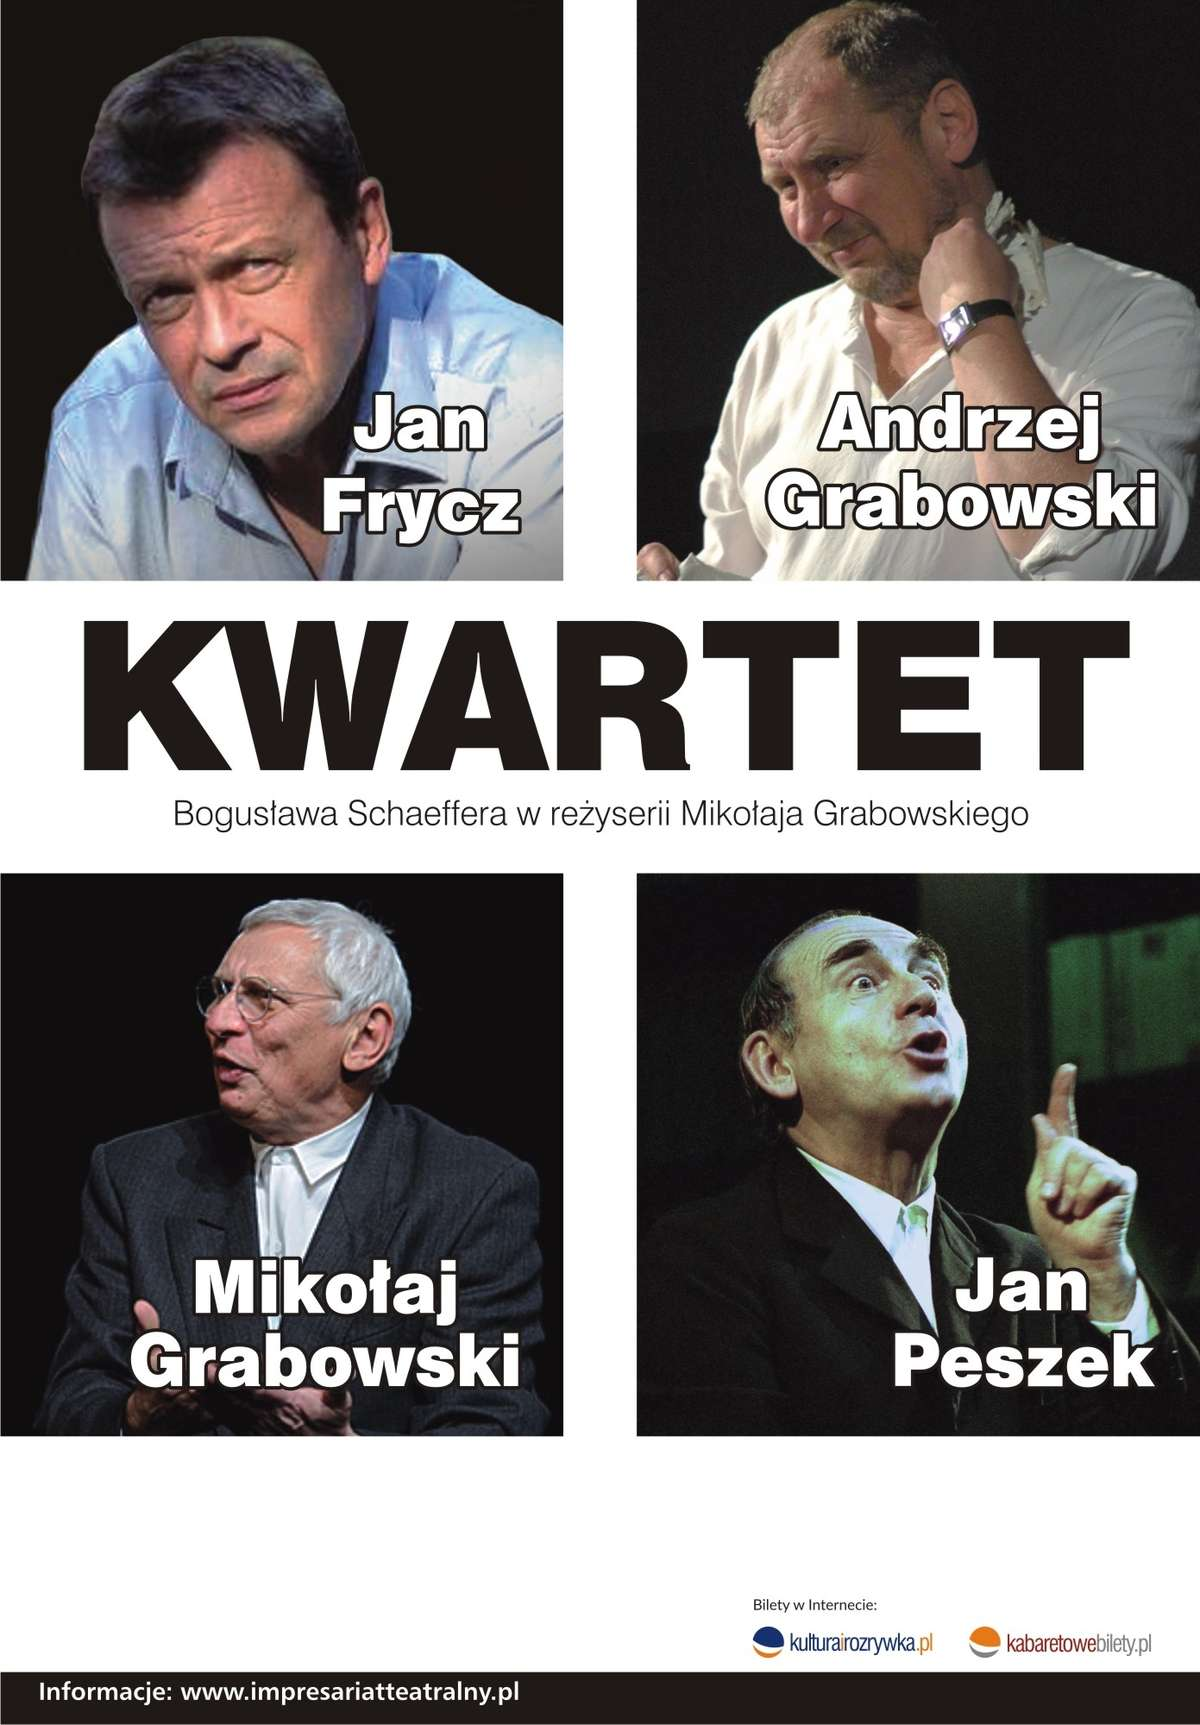 plakat kwartetu aktorów - full image